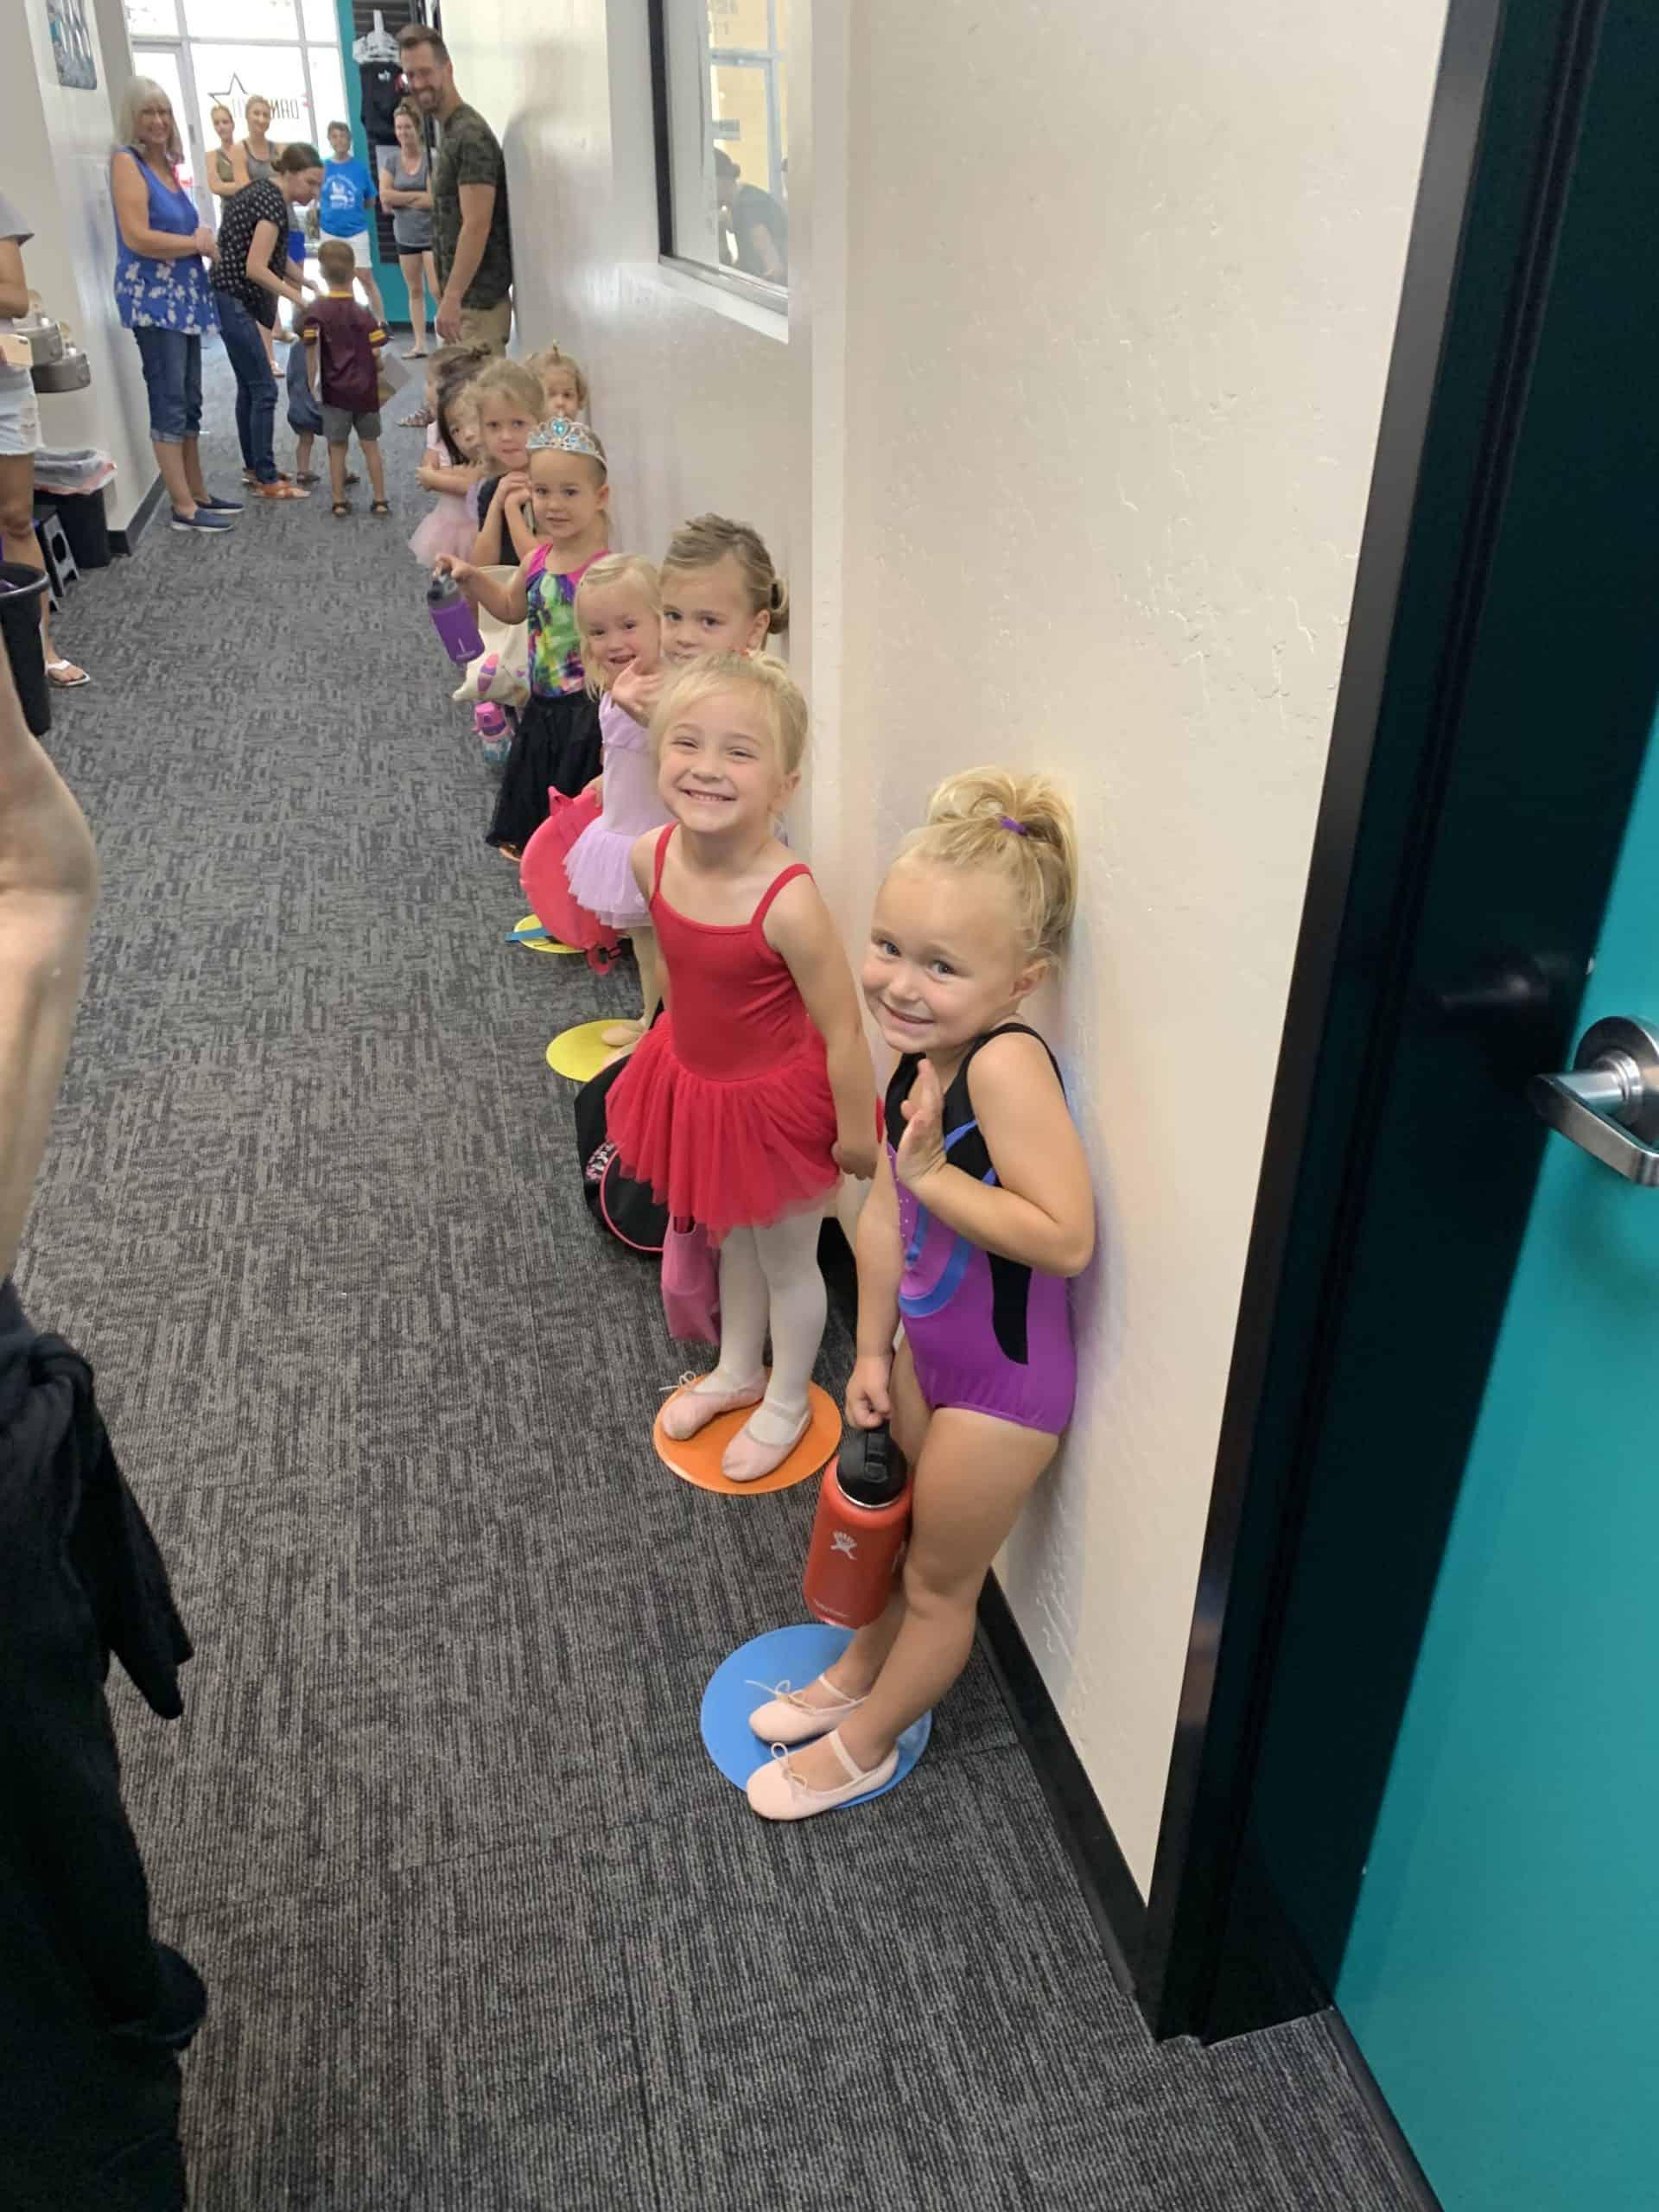 Dance 101 Dancers Waiting In Line